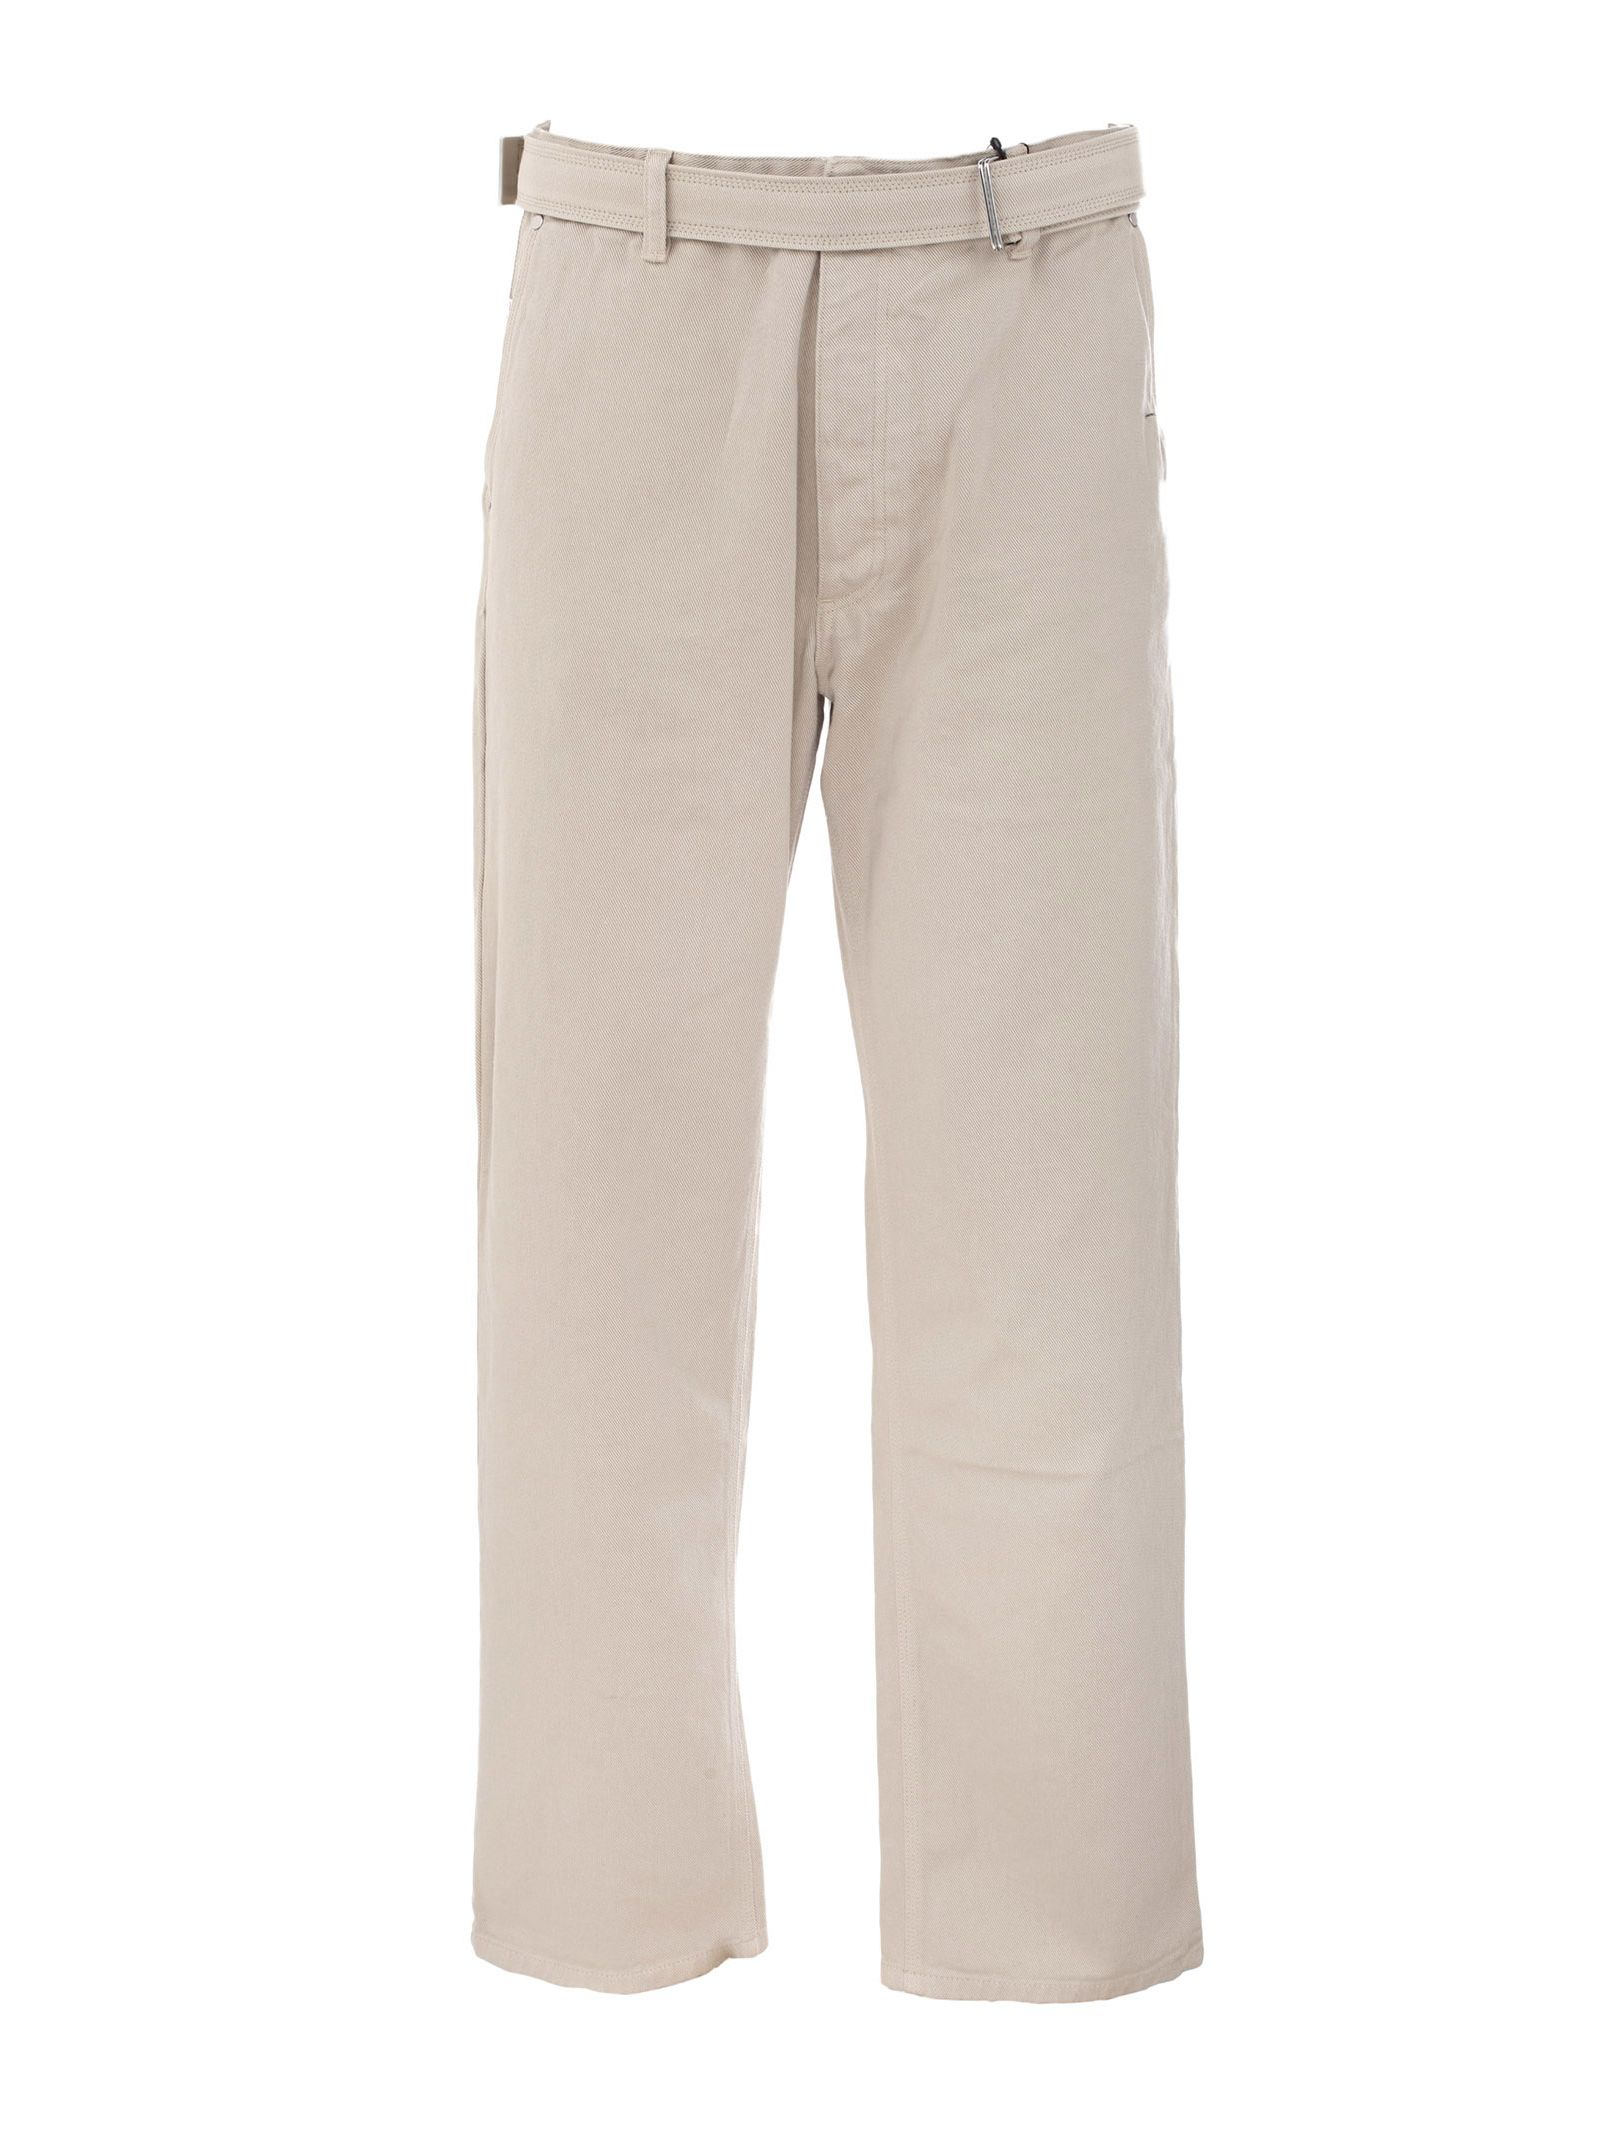 Ami fit jeans - Nude & Neutrals Ami OcRjgIJxq0